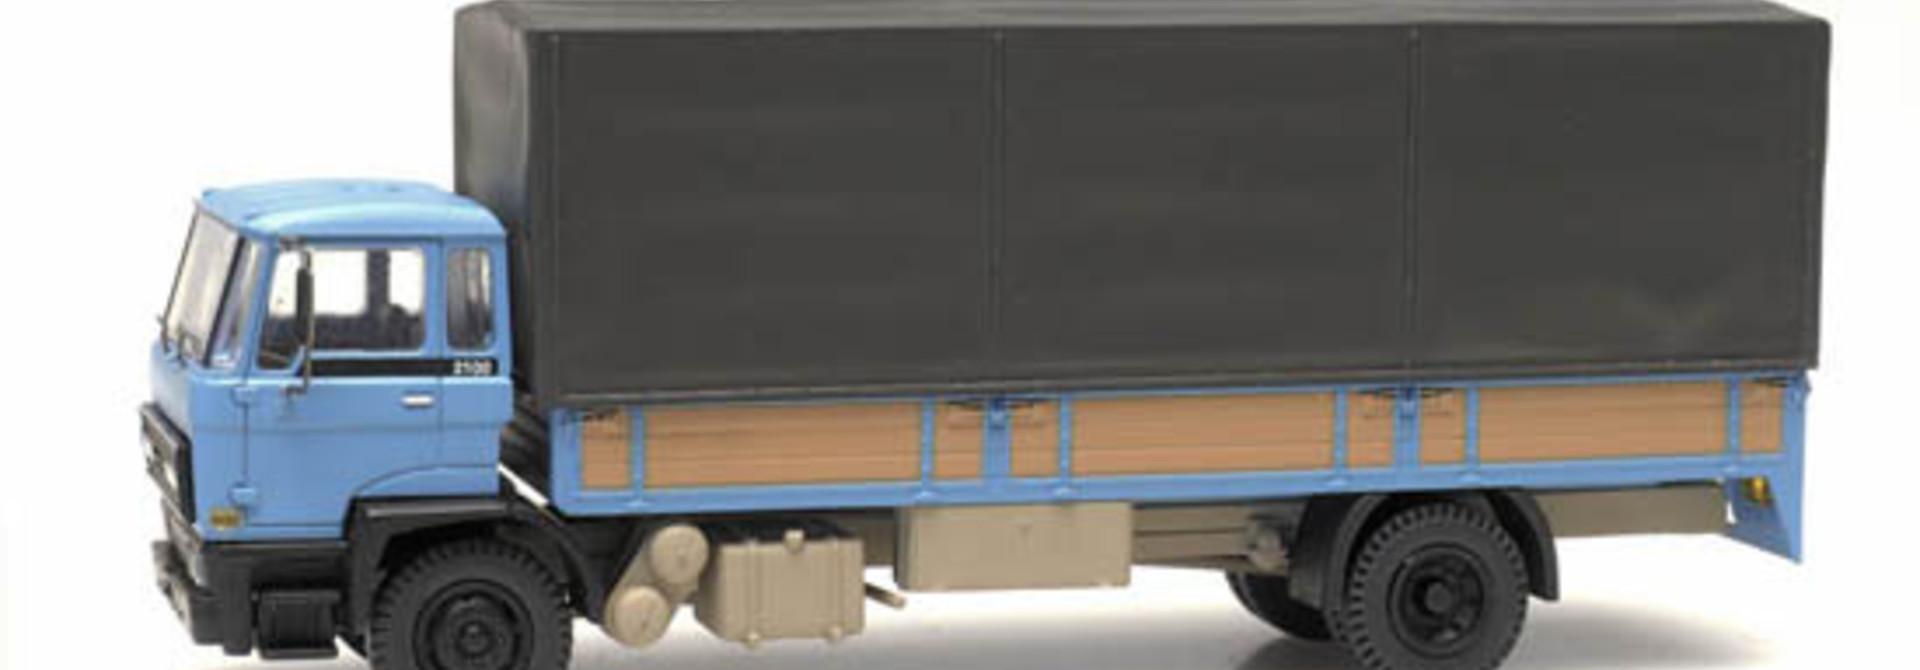 487.052.01 - DAF kantelcabine 1982, open bak, huif, blauw